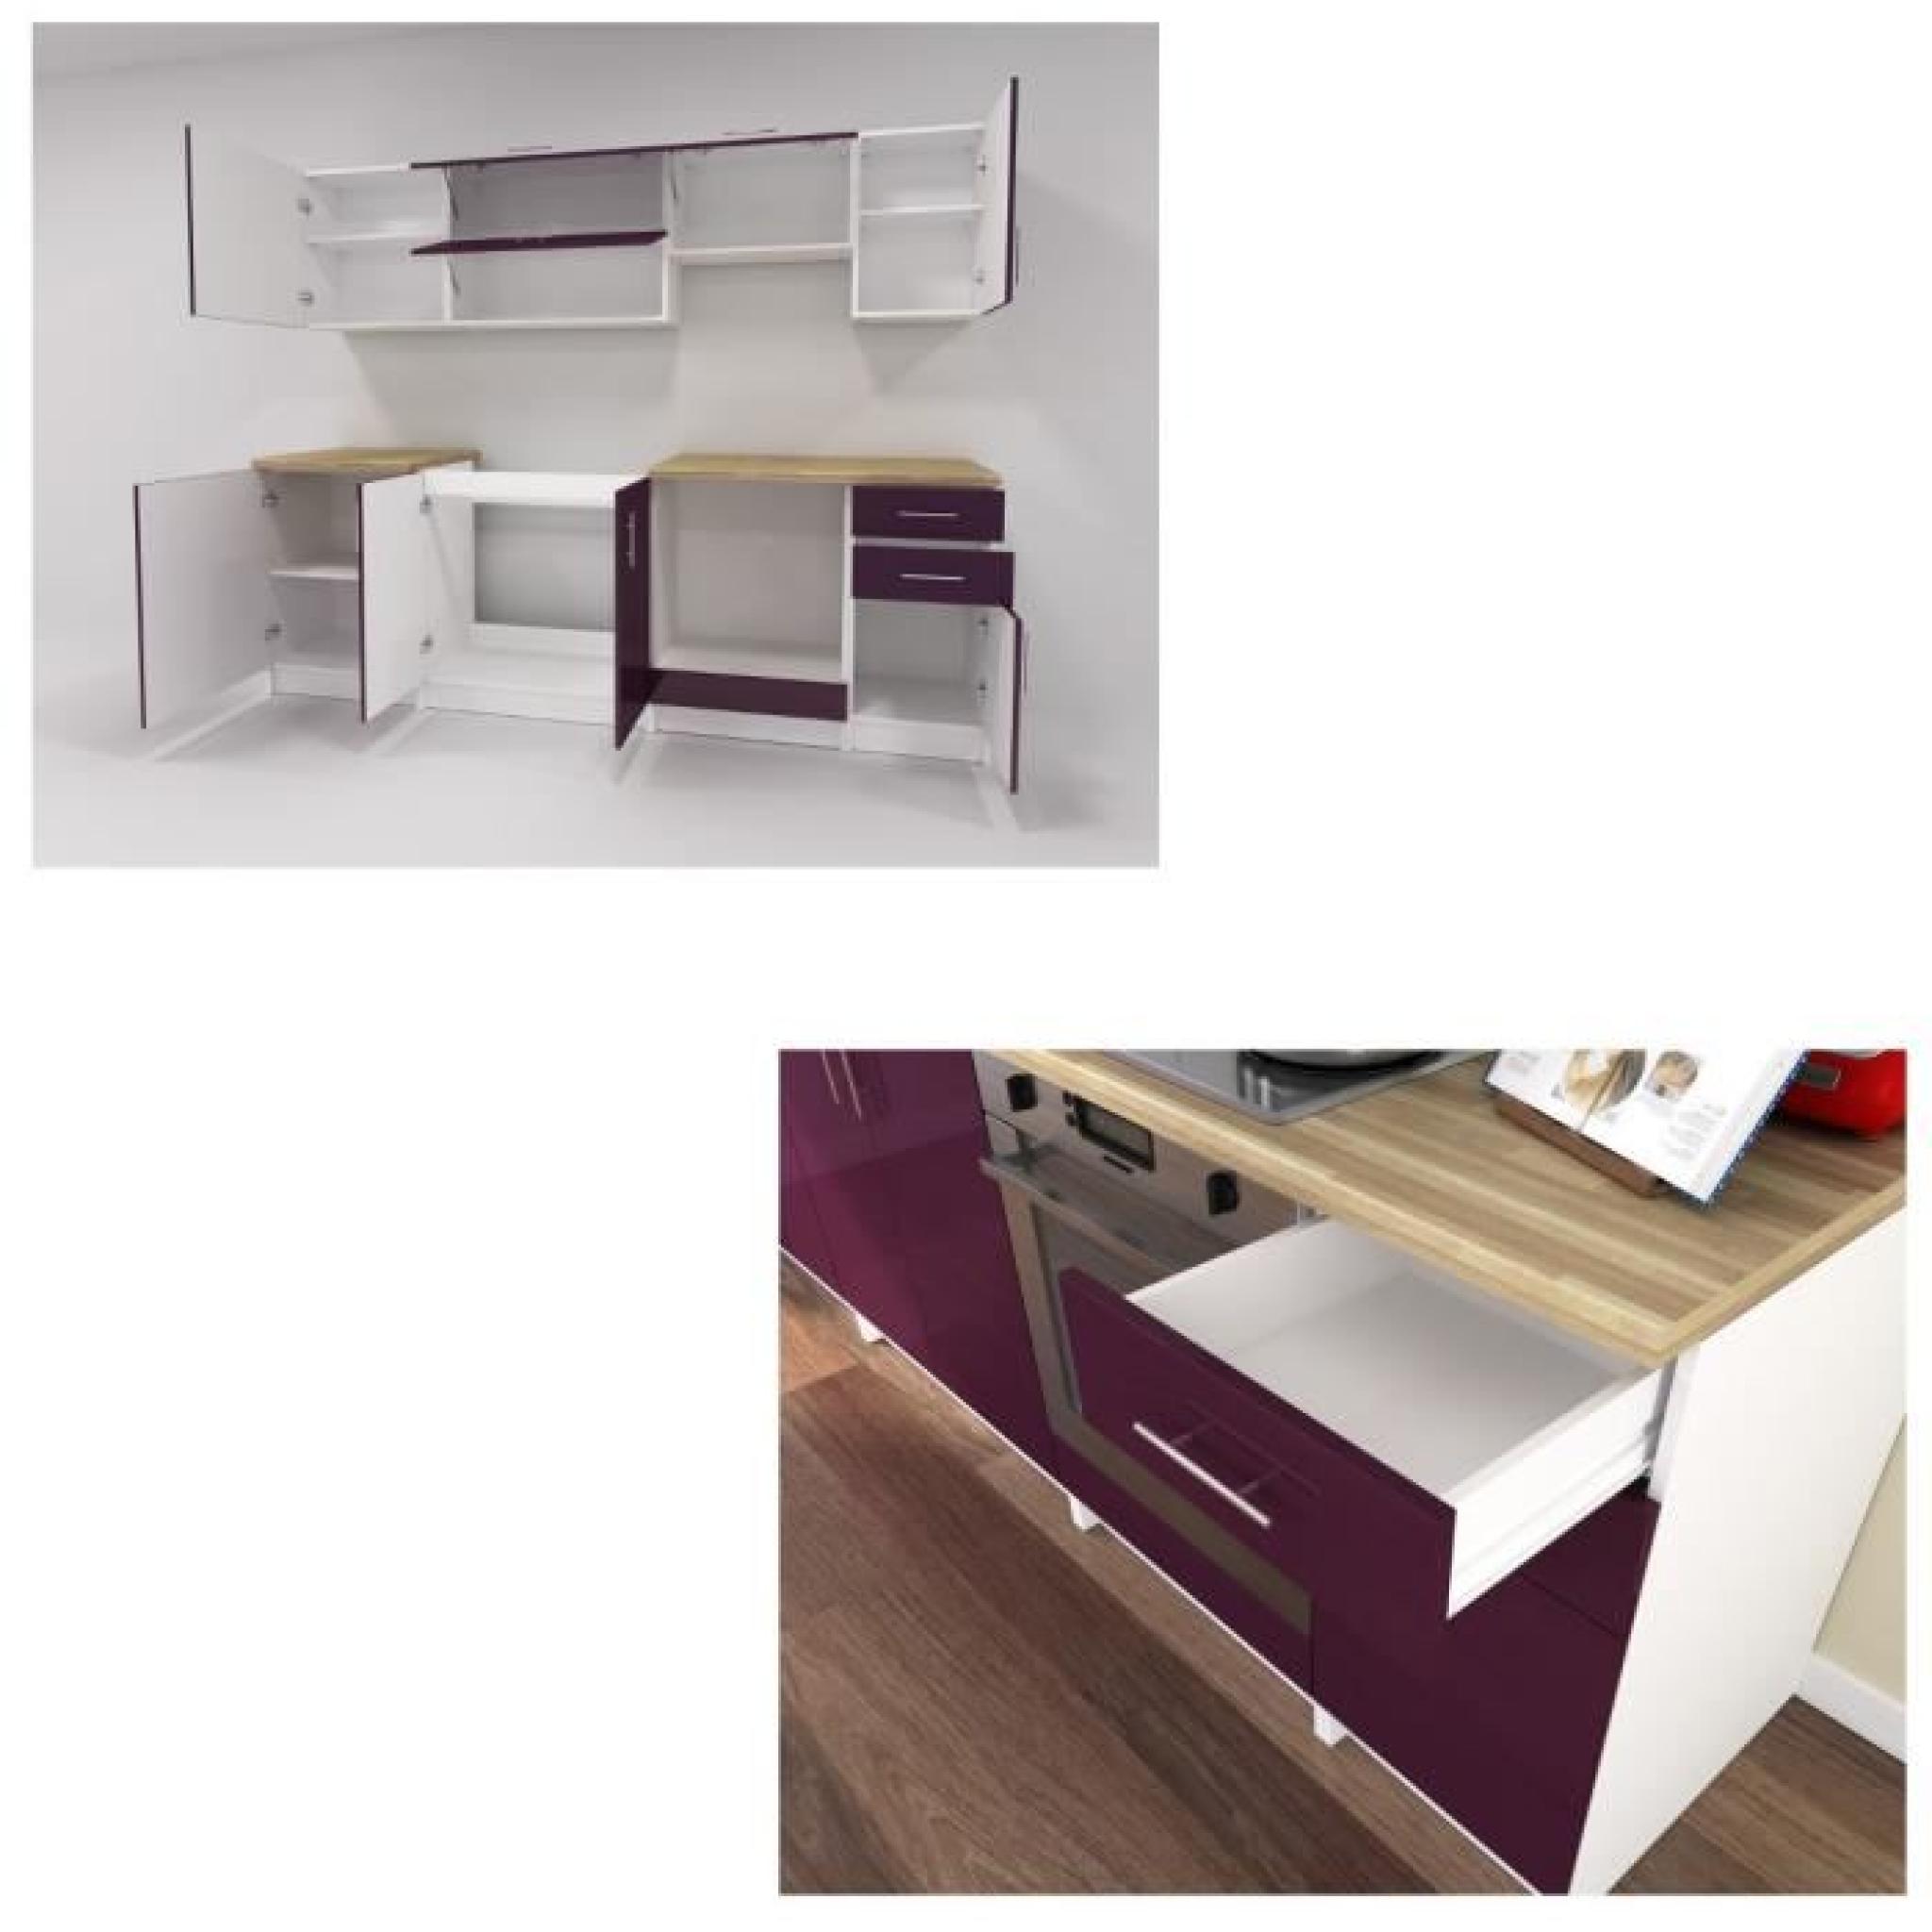 arty cuisine compl te 2m40 laqu aubergine haute brillance achat vente cuisine complete pas. Black Bedroom Furniture Sets. Home Design Ideas